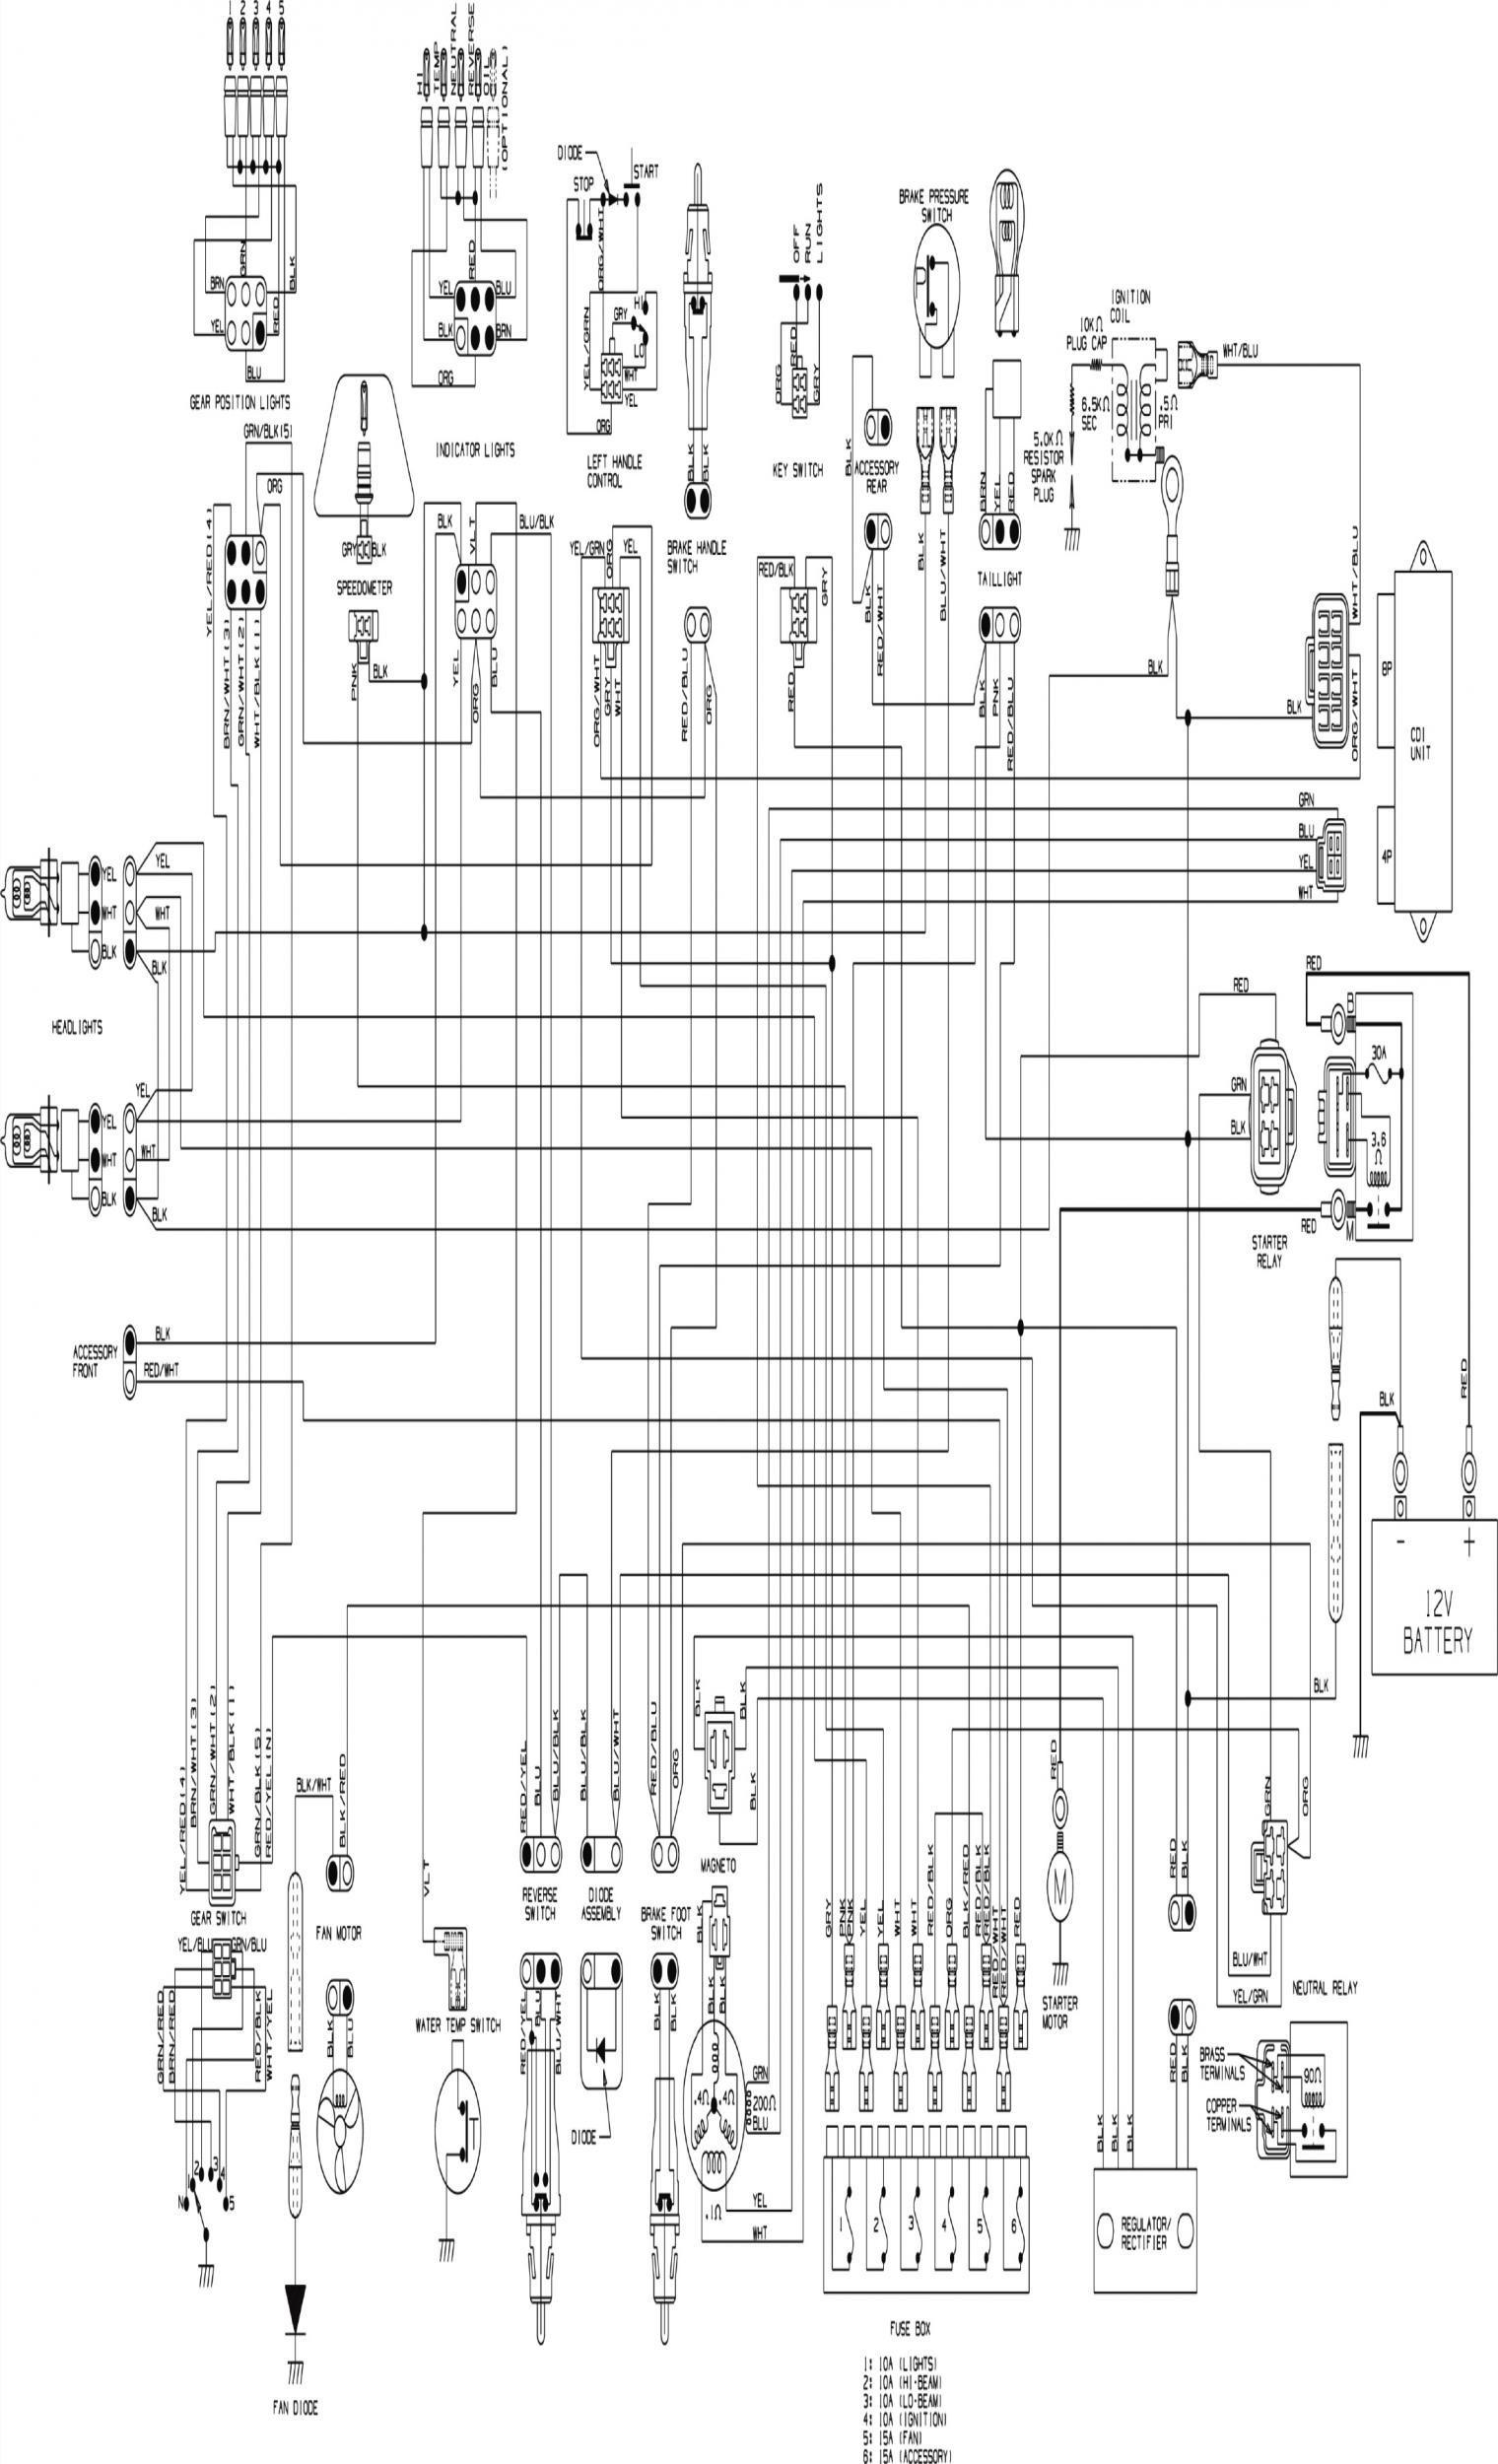 Caterpillar Starter Wiring Diagram